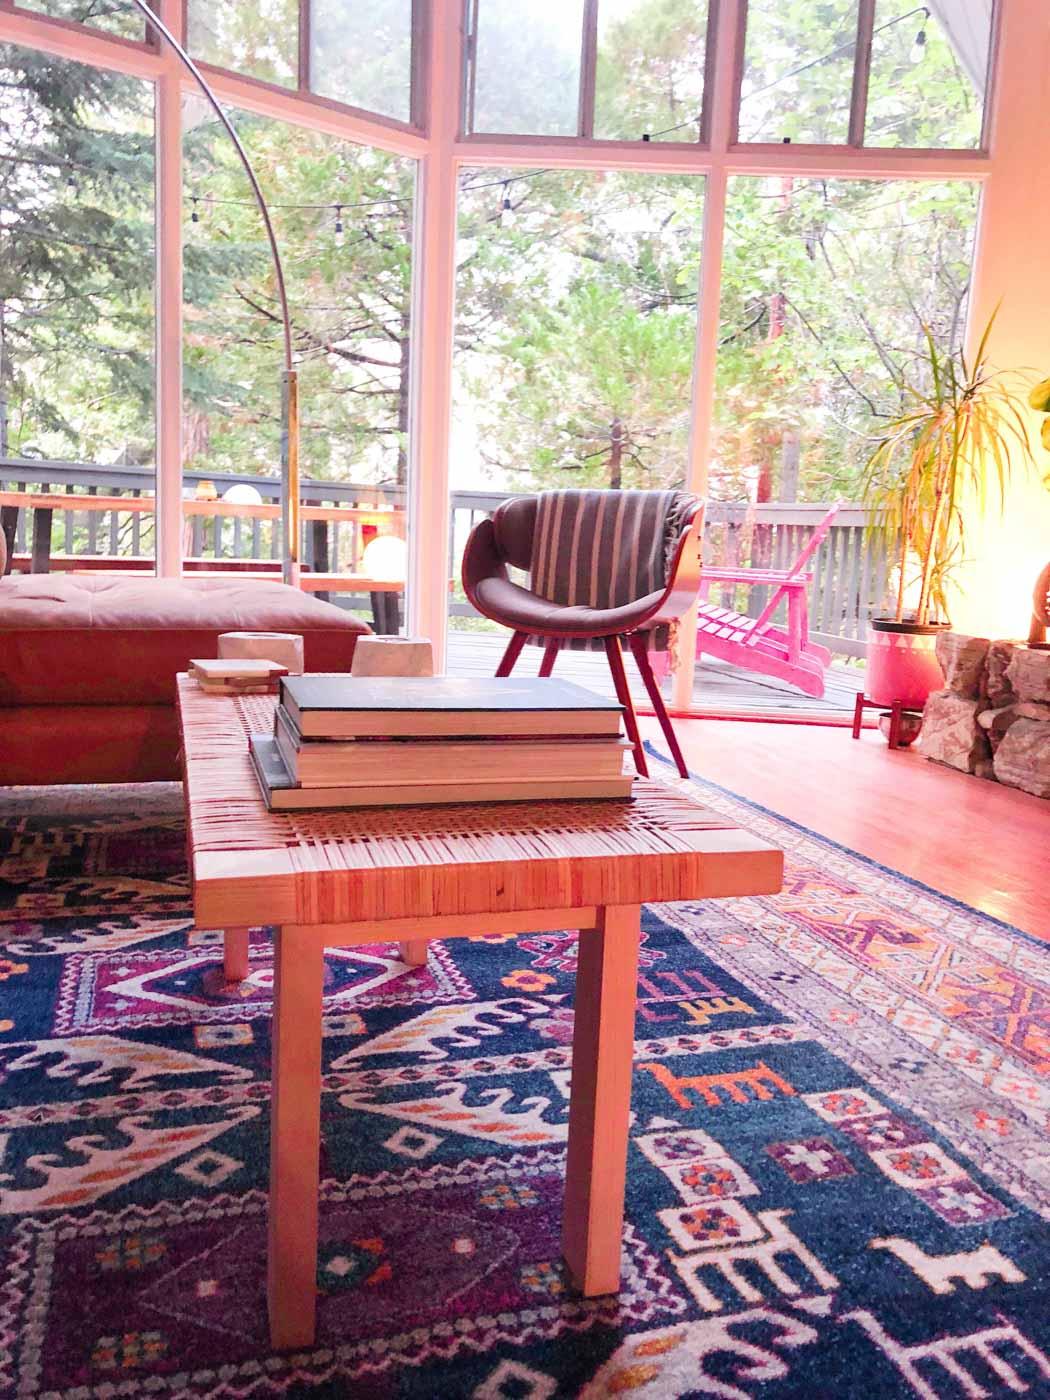 CozyDoesIt-LakeArrowheadCA-natural-light-photography-studio-lifestyle-photoshoot-location-editorial-commercial-photography-19.jpg